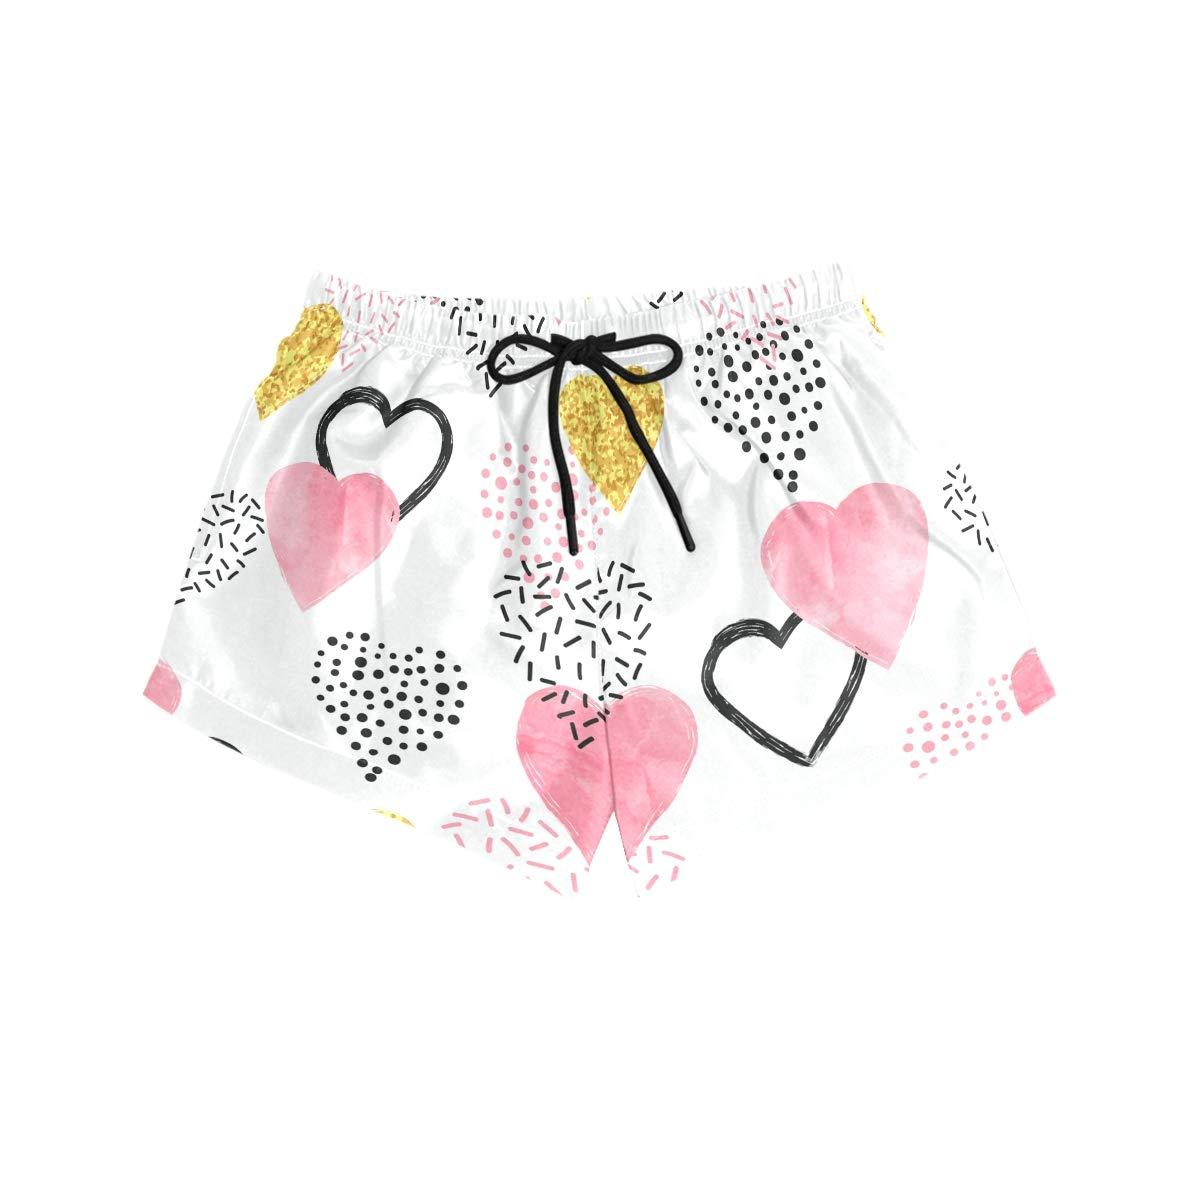 CENHOME Women Swim Trunks Glittering Gold Pink Hearts Pattern Beach Board Shorts